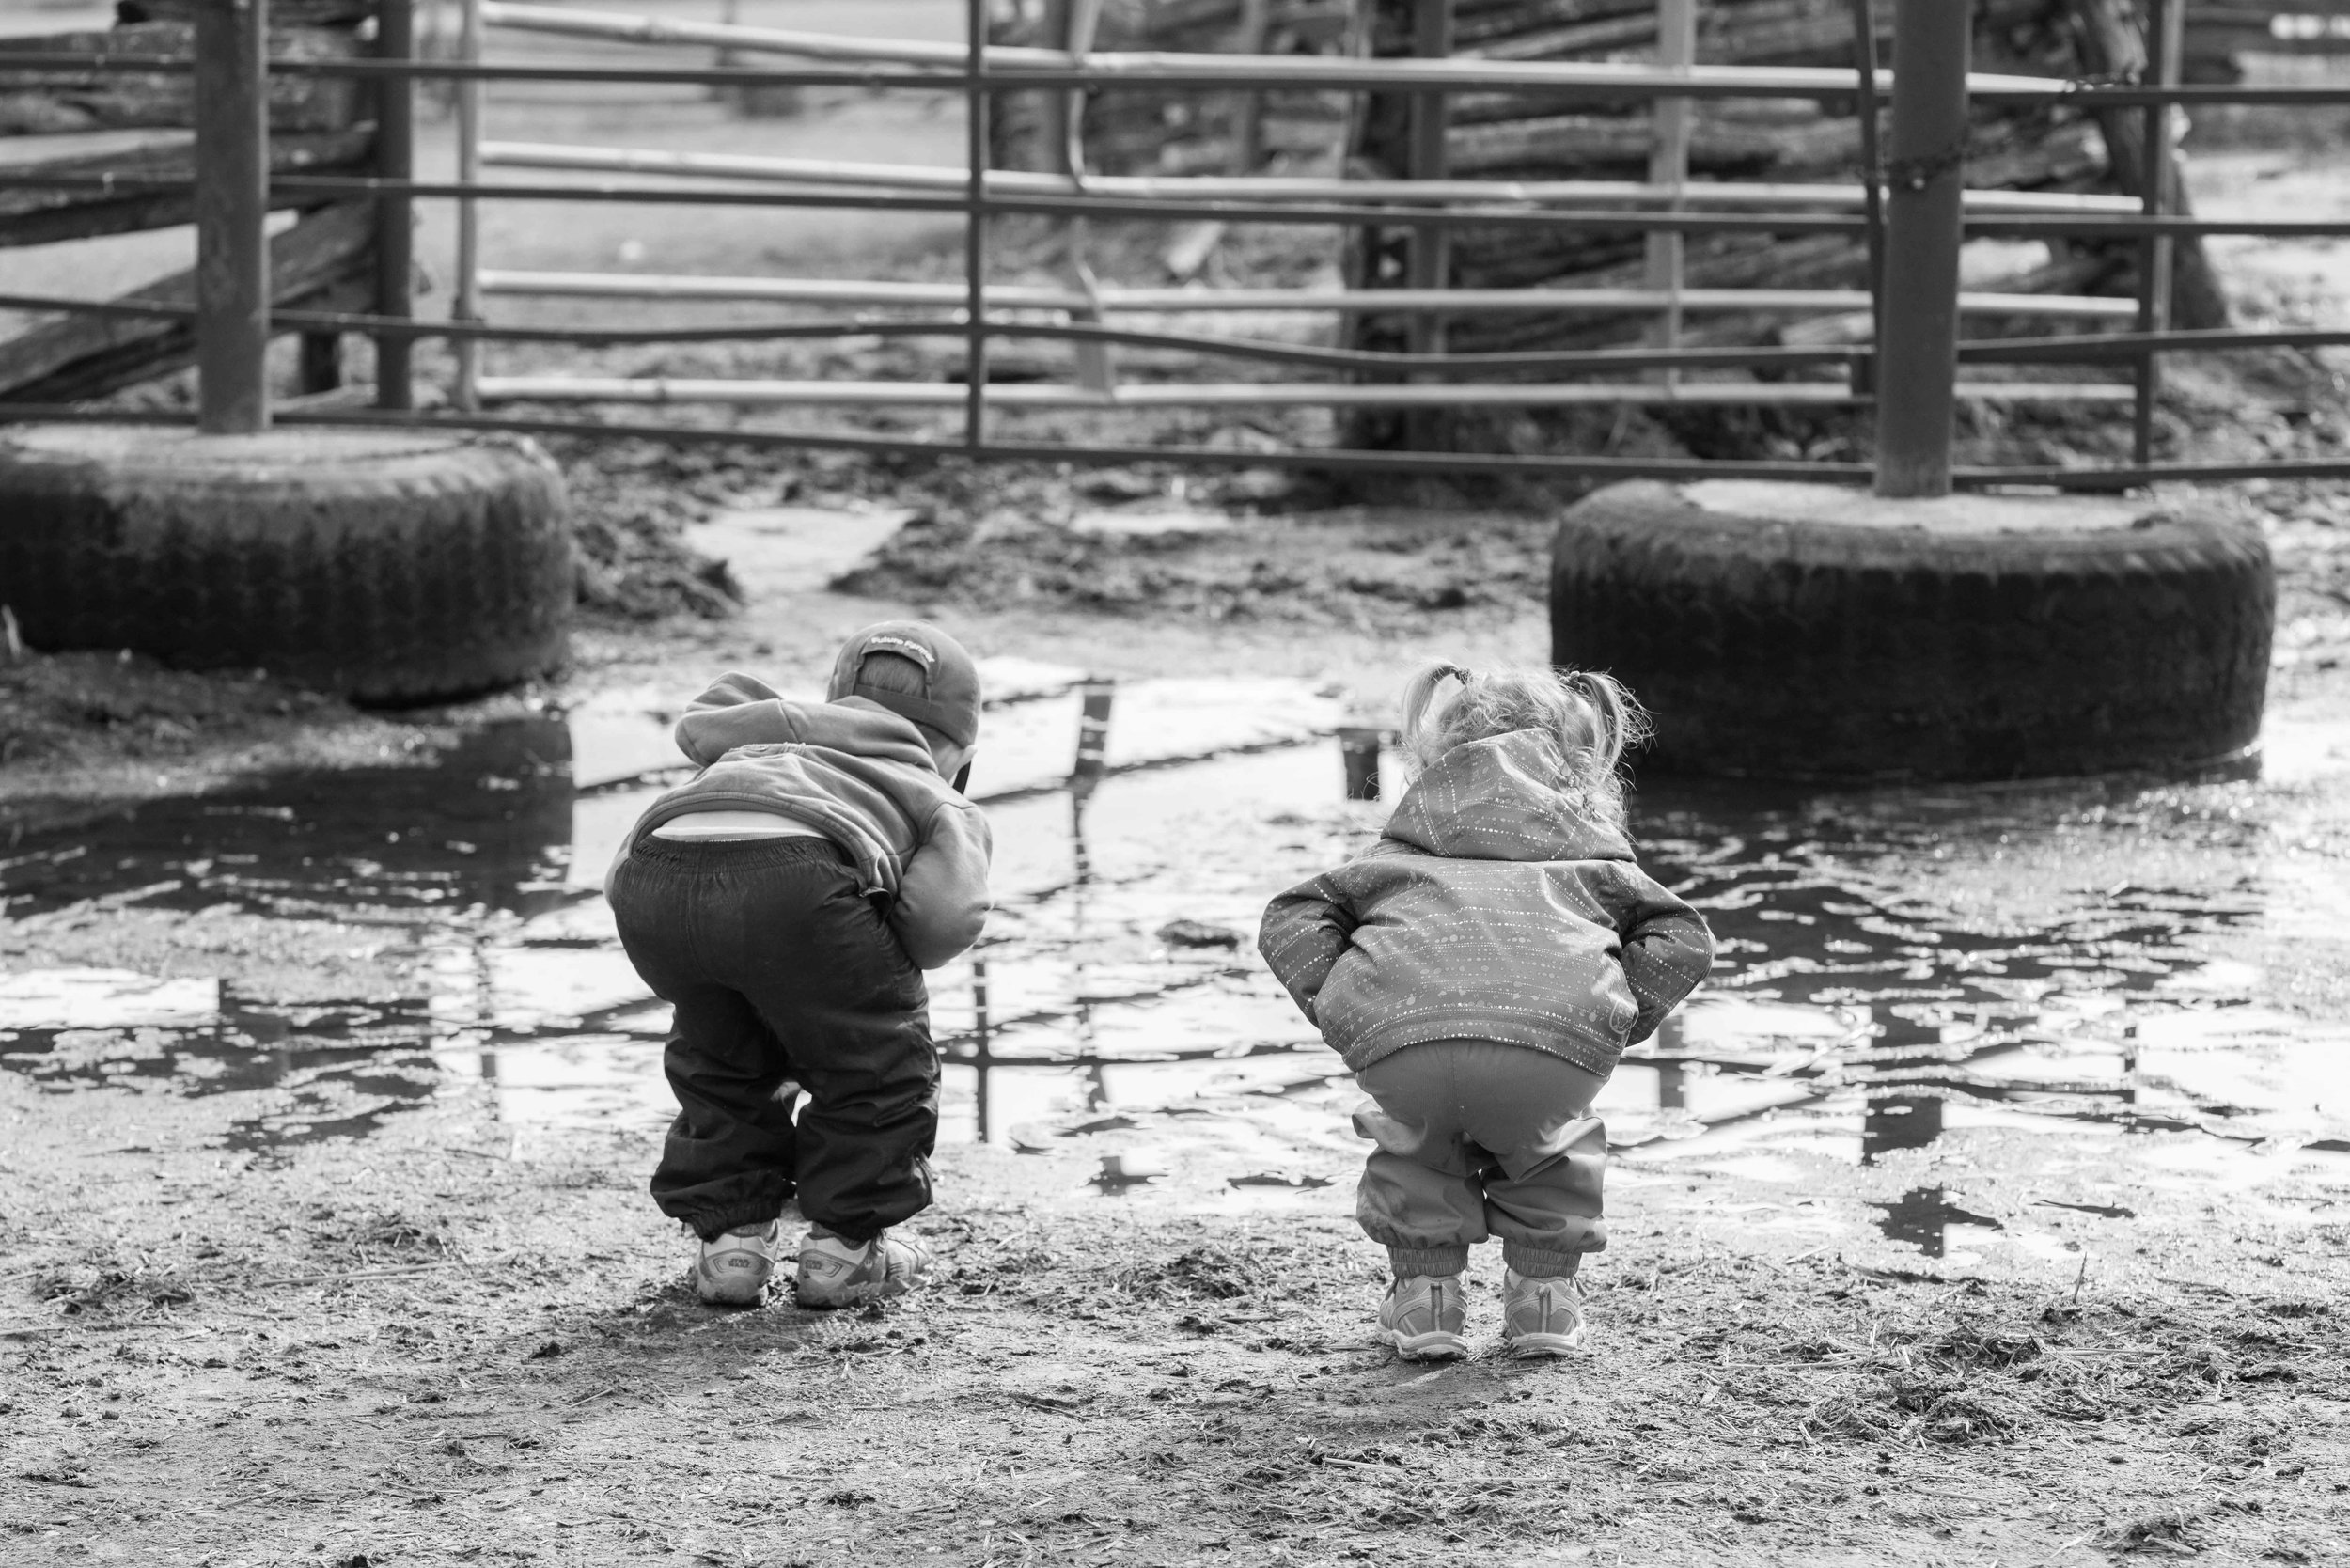 holly-mcfarlane-farm-kids